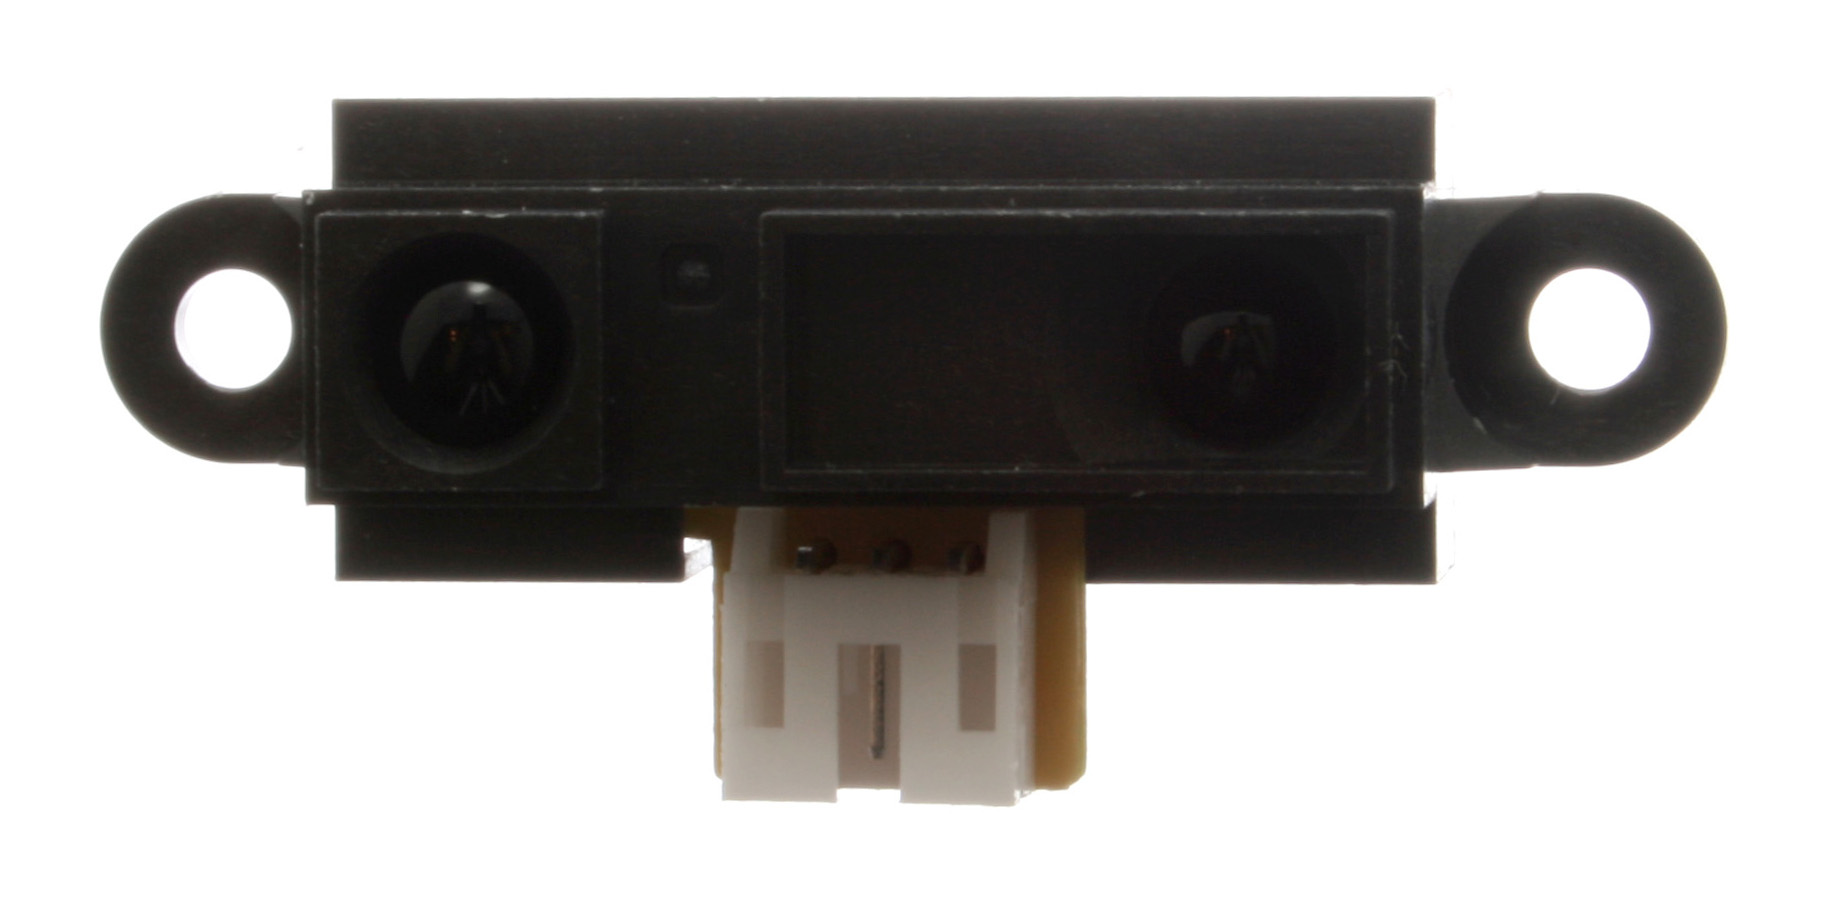 Switch Knife Fuse Box Sharp Gp2y0a21yk Ir Proximity Sensor Cropped